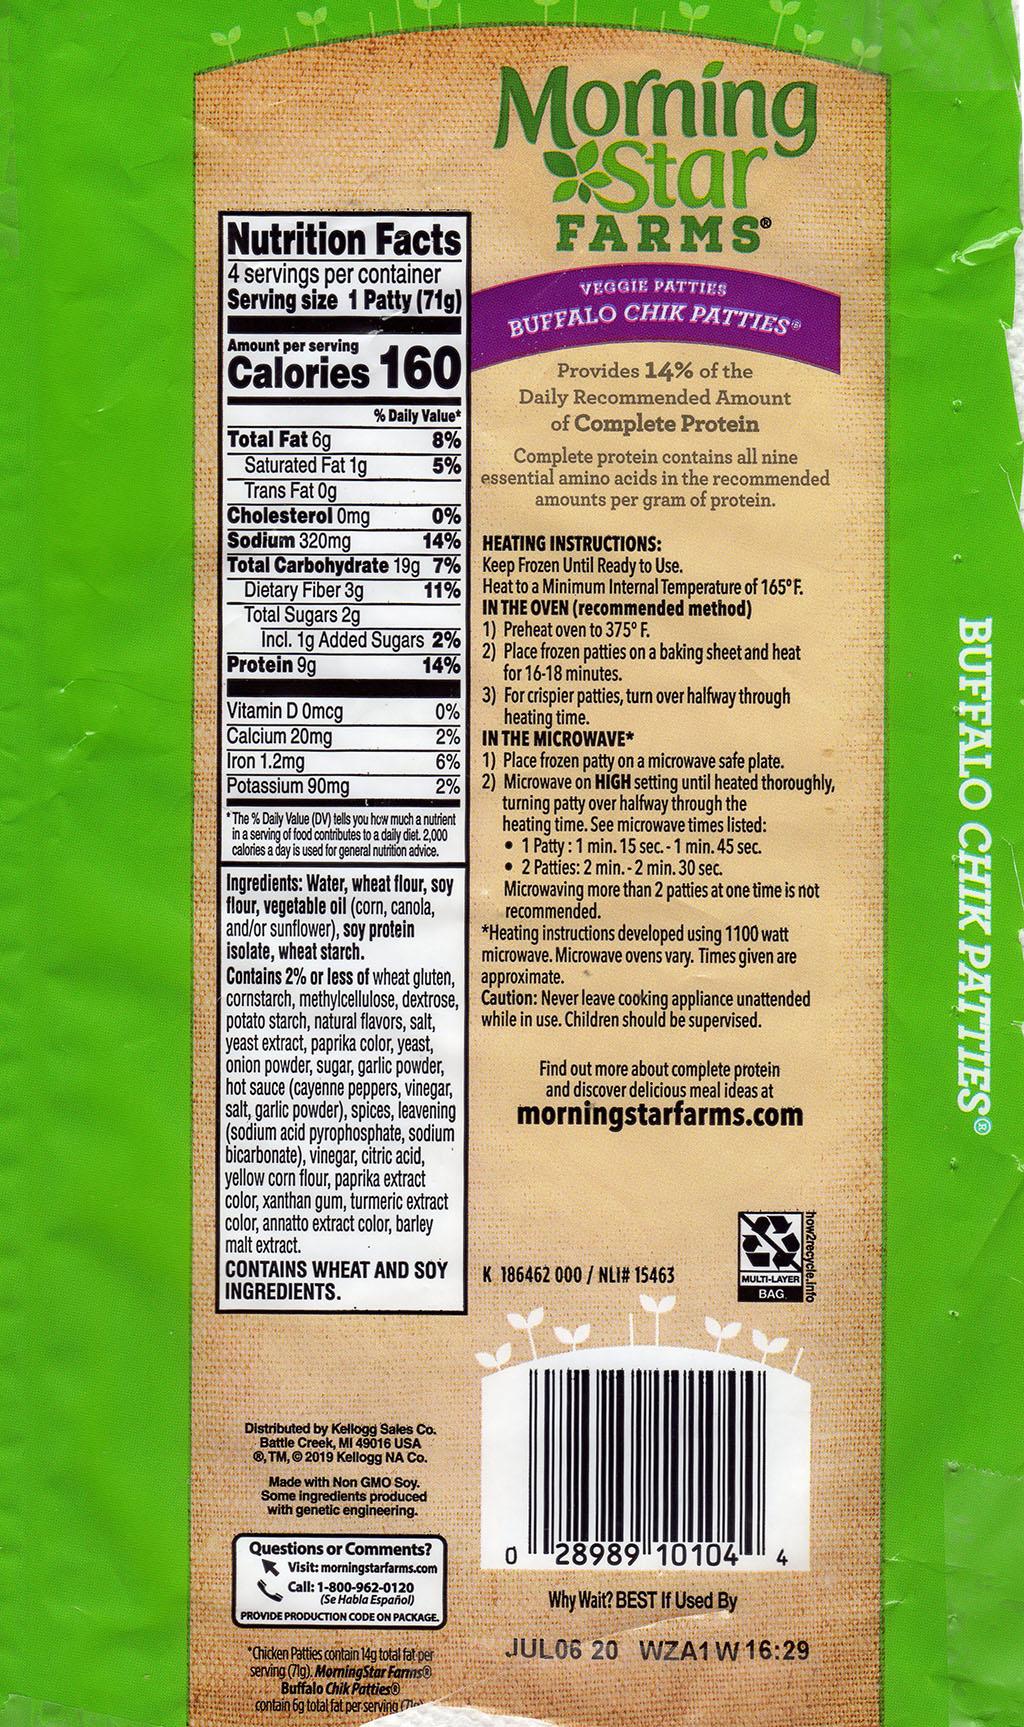 MorningStar Farms Buffalo Chik Patties 2019 ingredients vegan